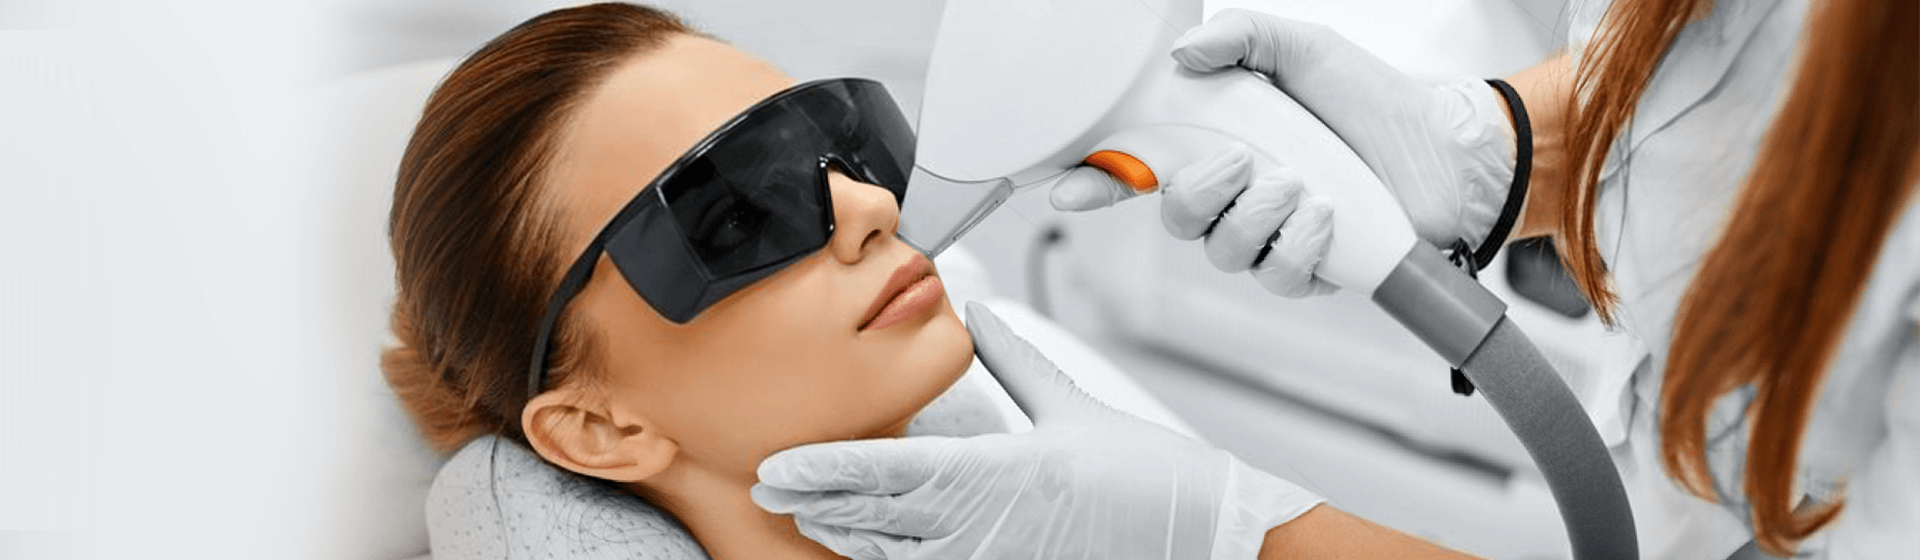 AL-Masa-12-Feb-Our-Services-SkinCare-option-1